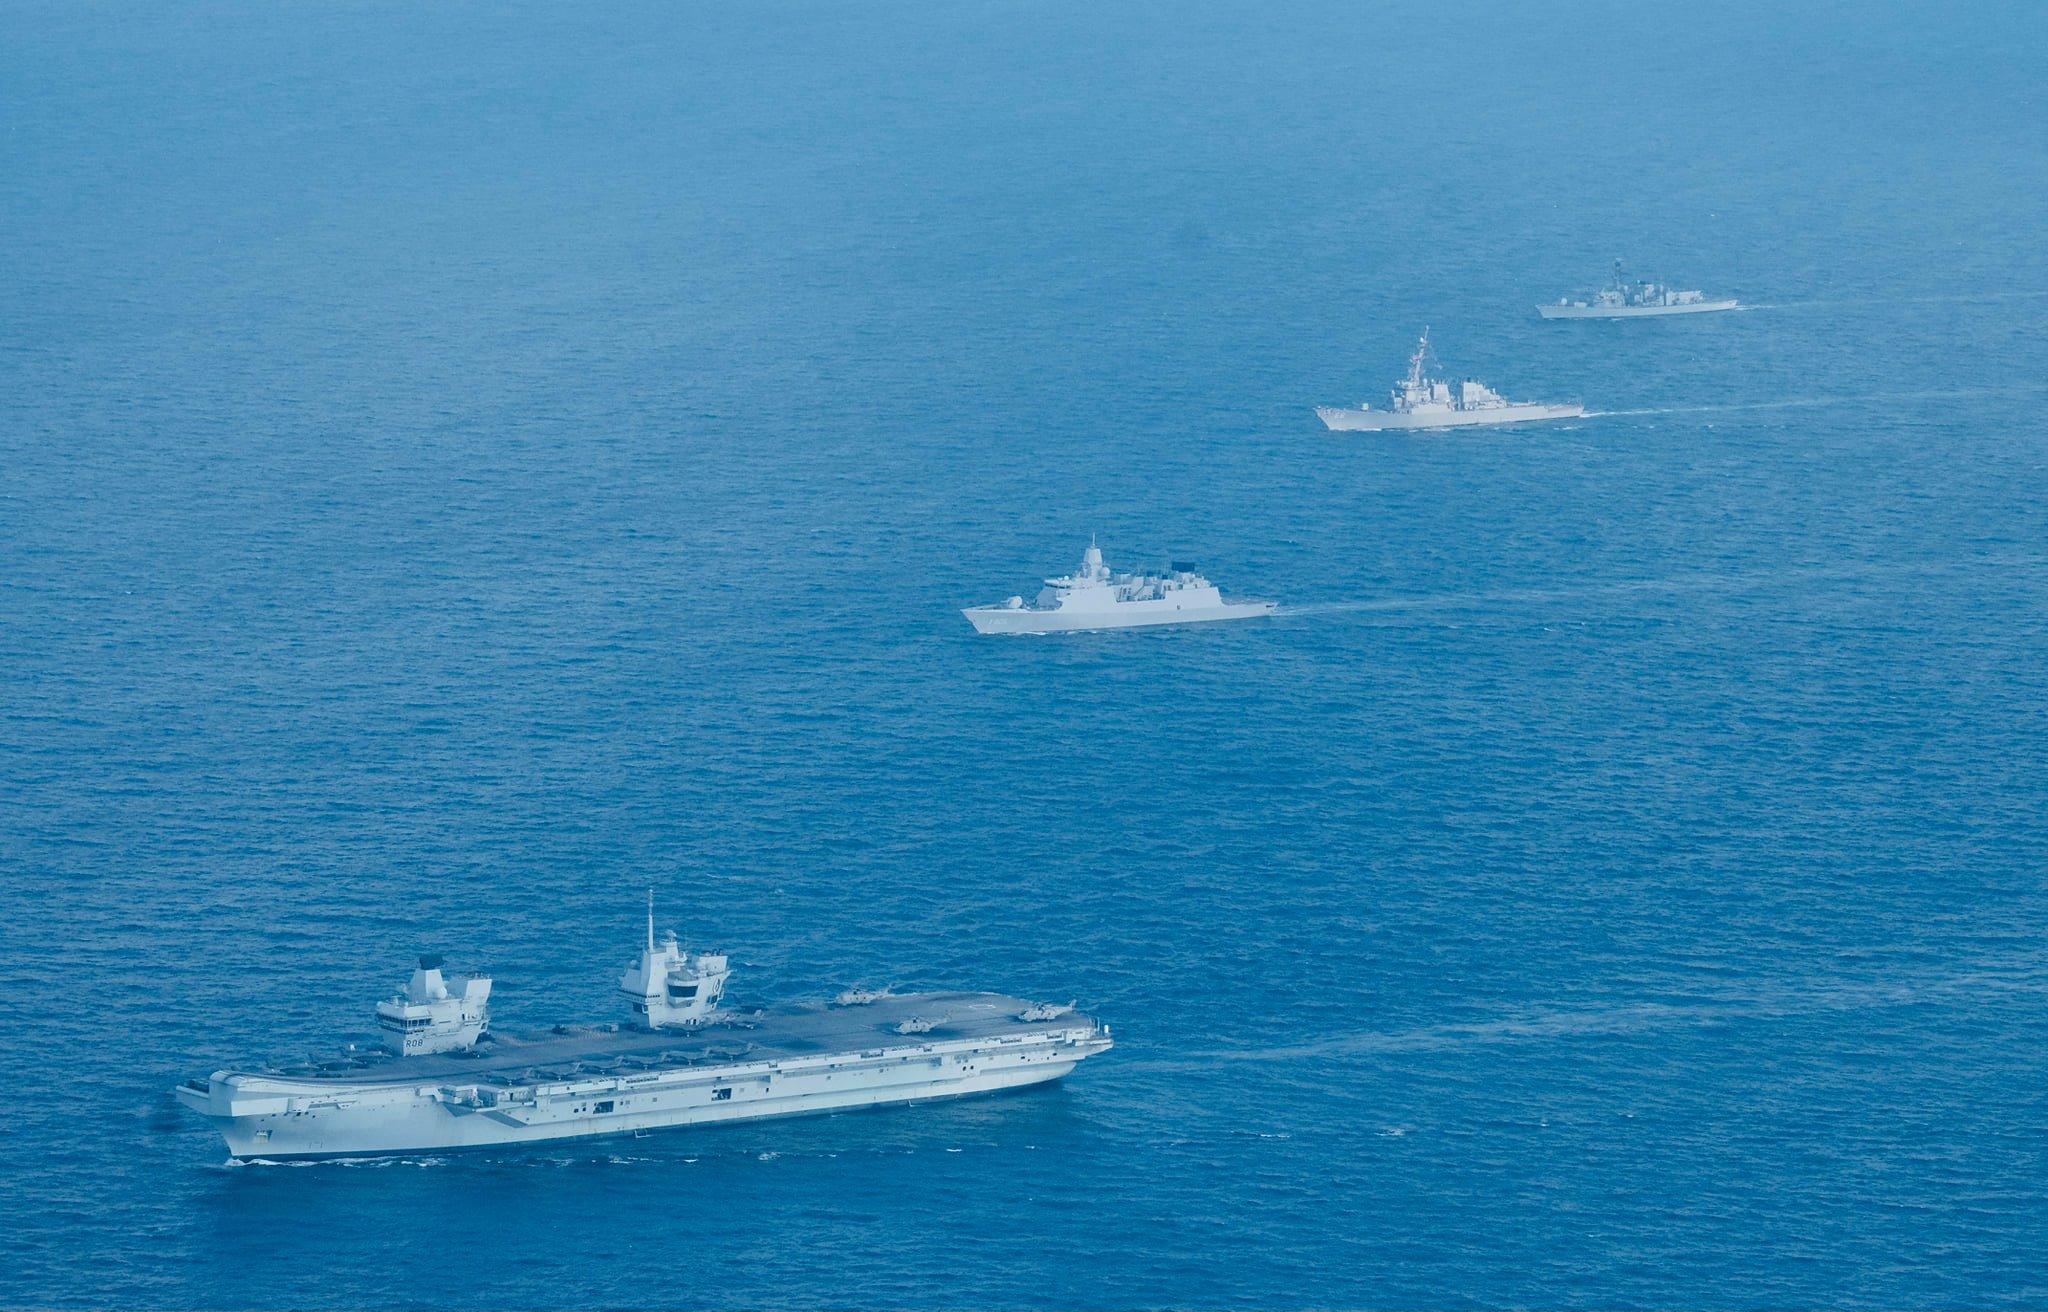 Germany Sends Warship to South China Sea